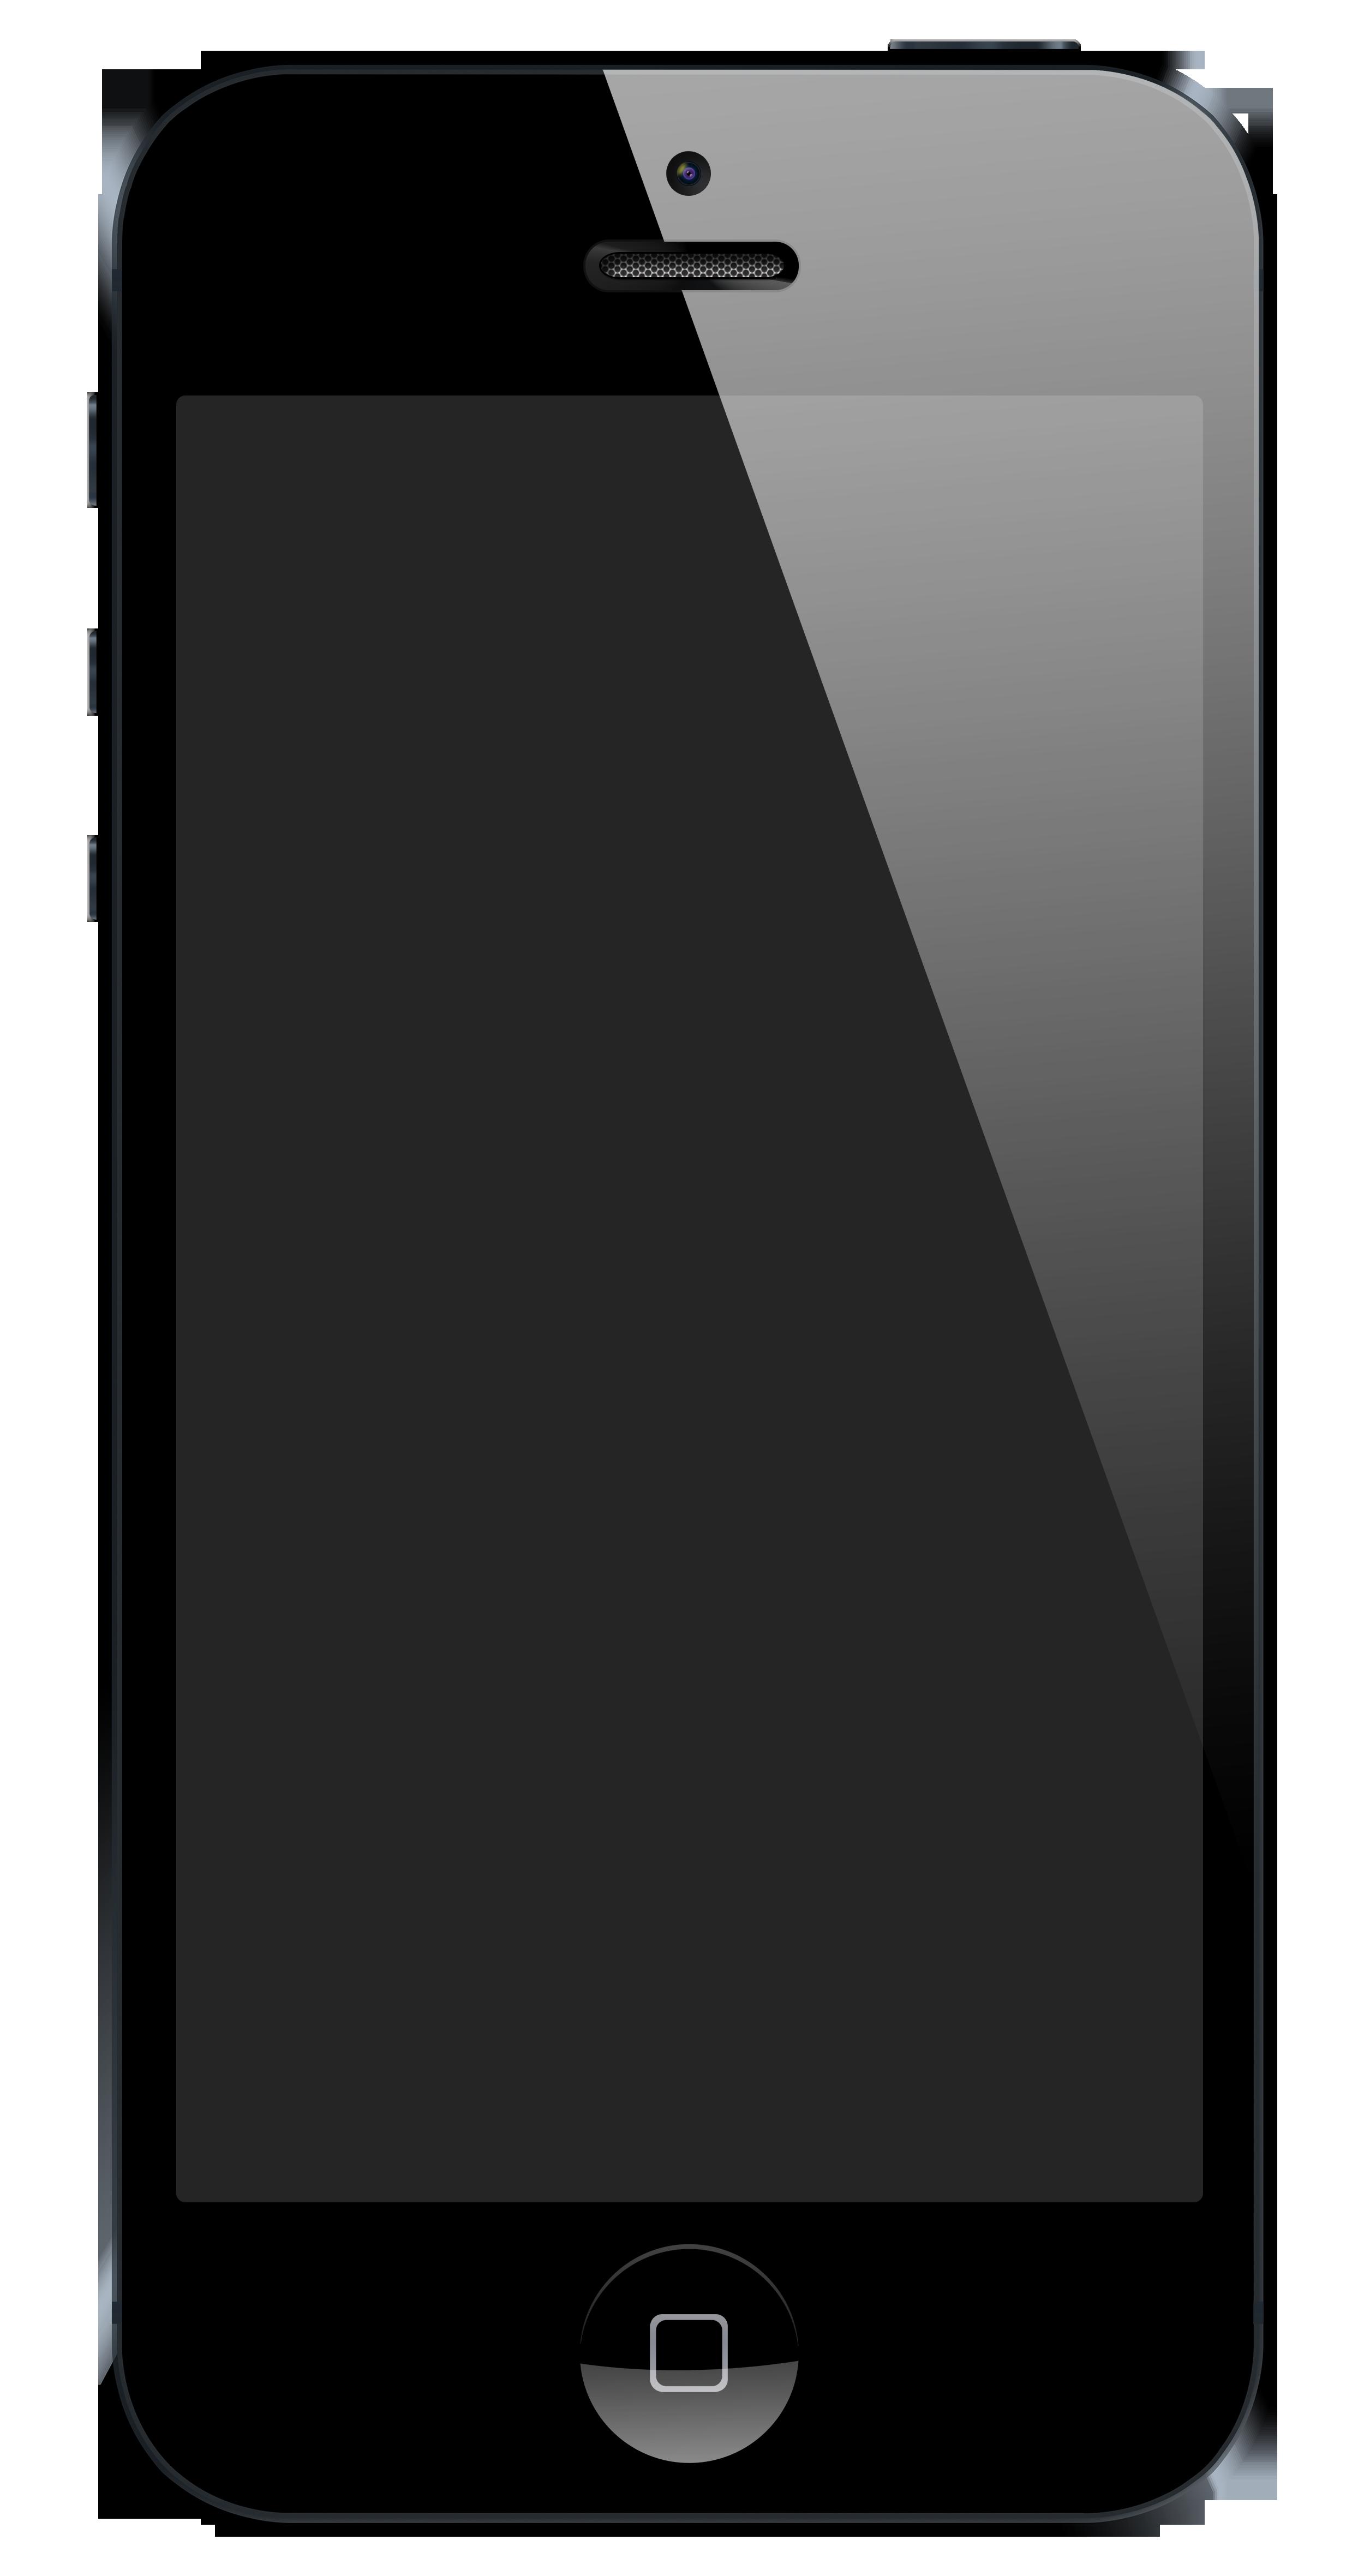 Iphone 5 clipart size jpg transparent Iphone 5 size clipart - ClipartFox jpg transparent